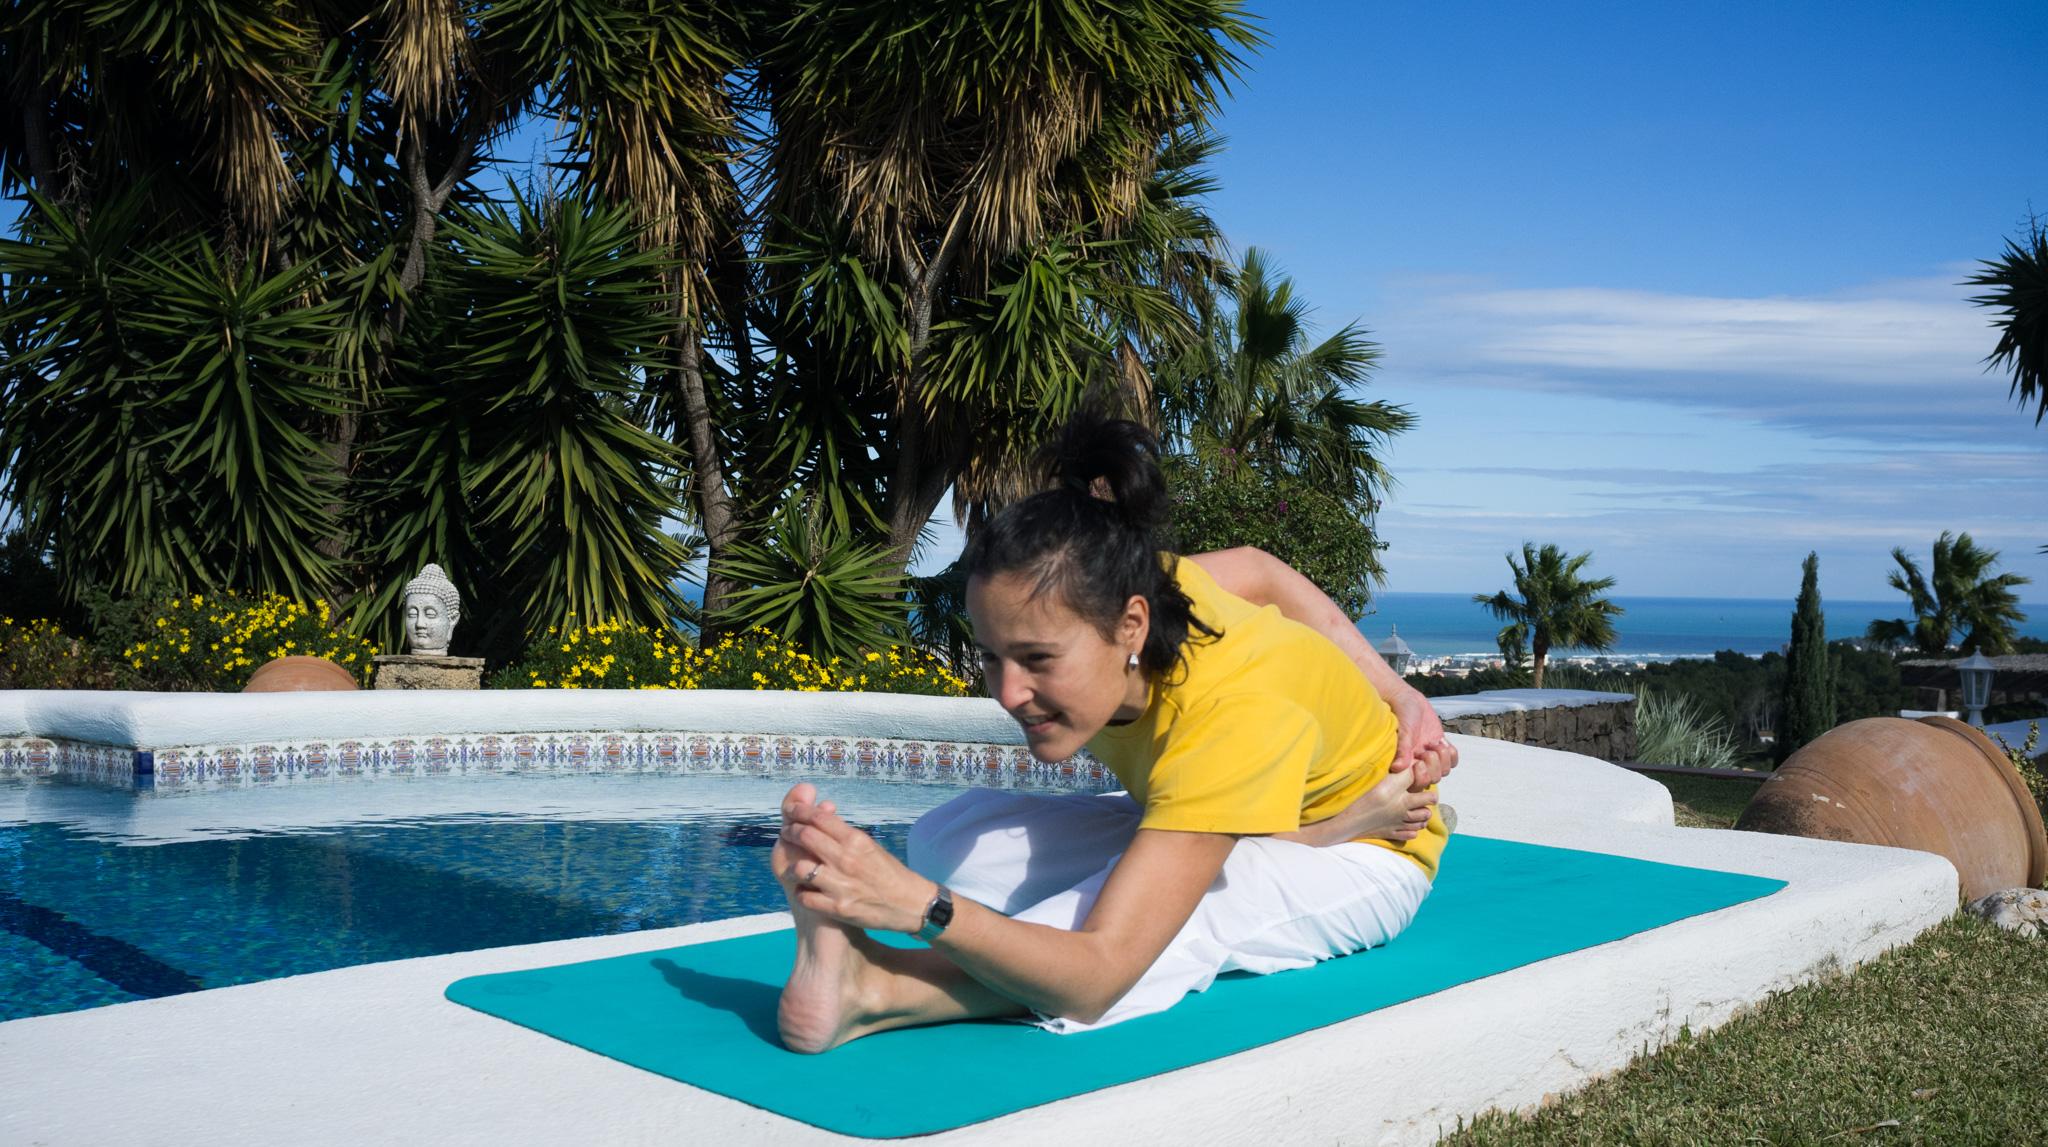 yoga pool-12.jpg